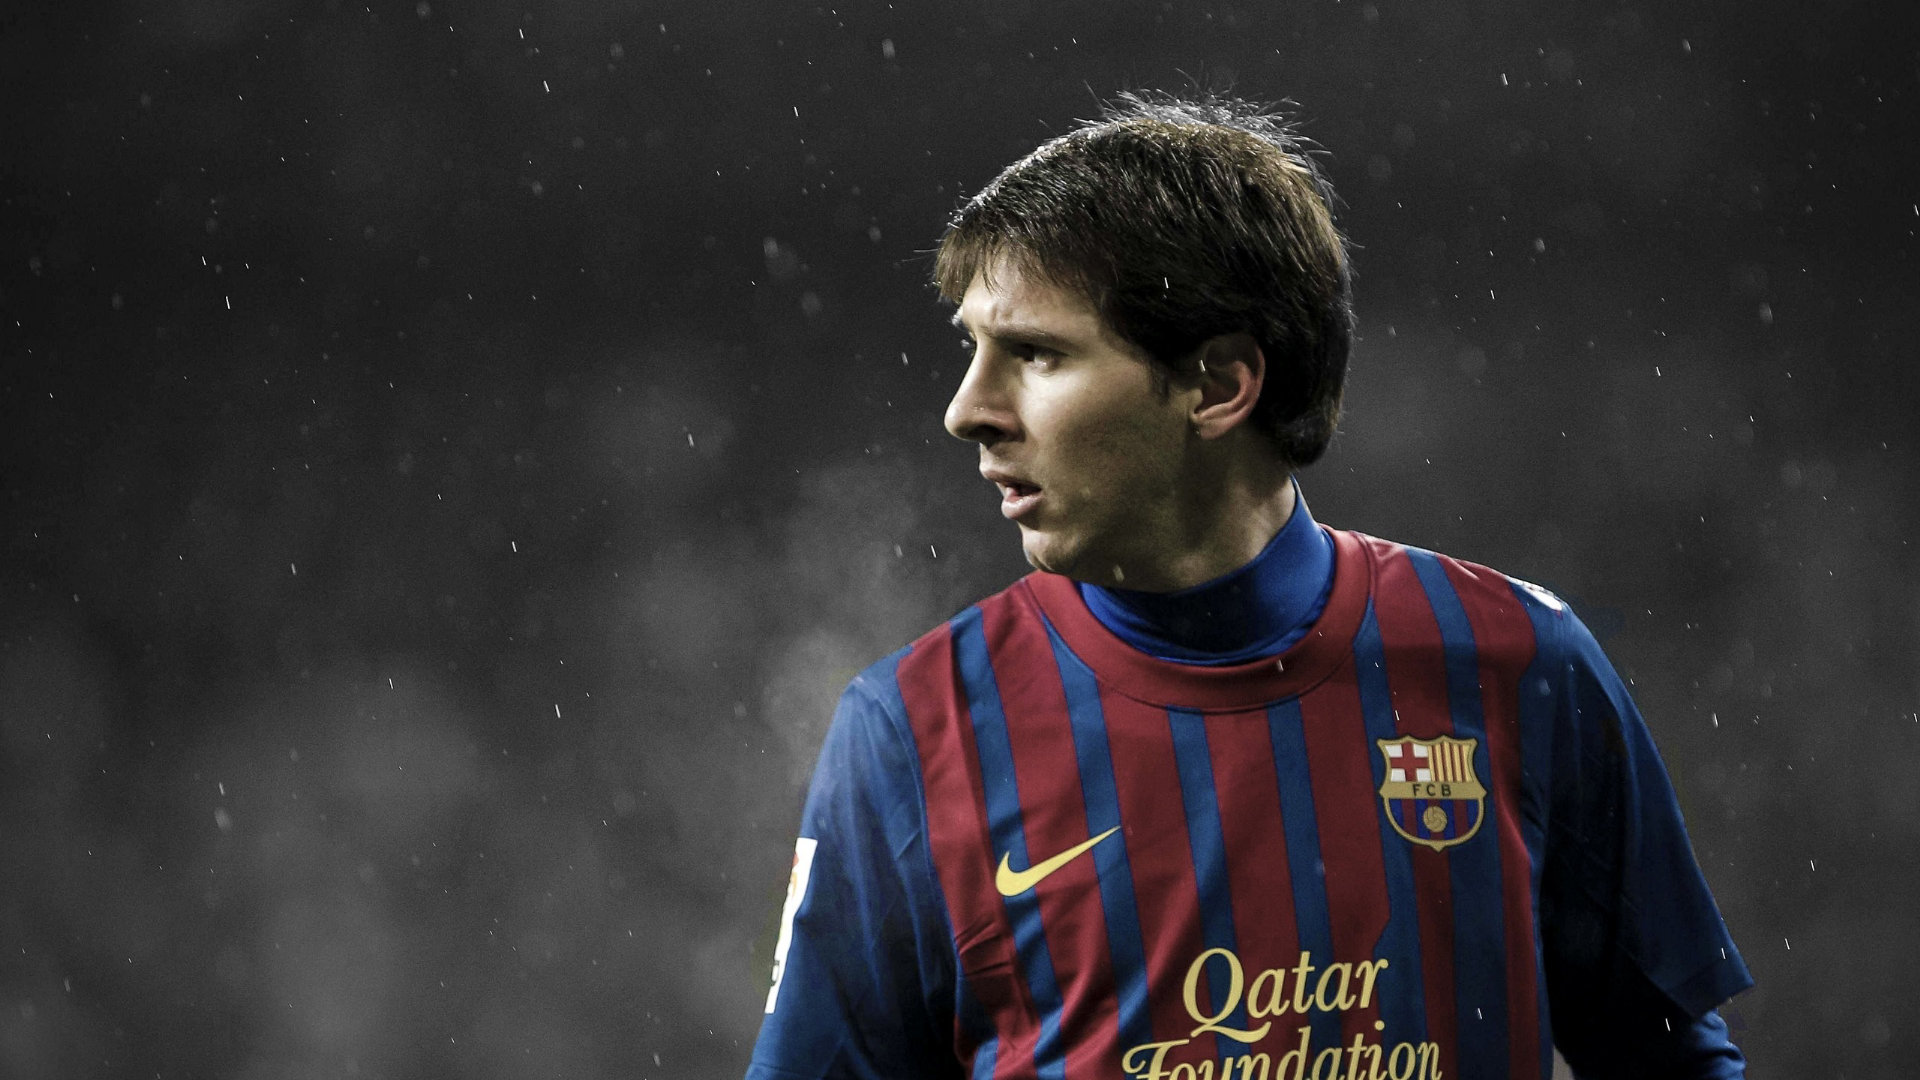 Lionel Messi HD Wallpapers 1080p   Football Wallpaper HD Football 1920x1080